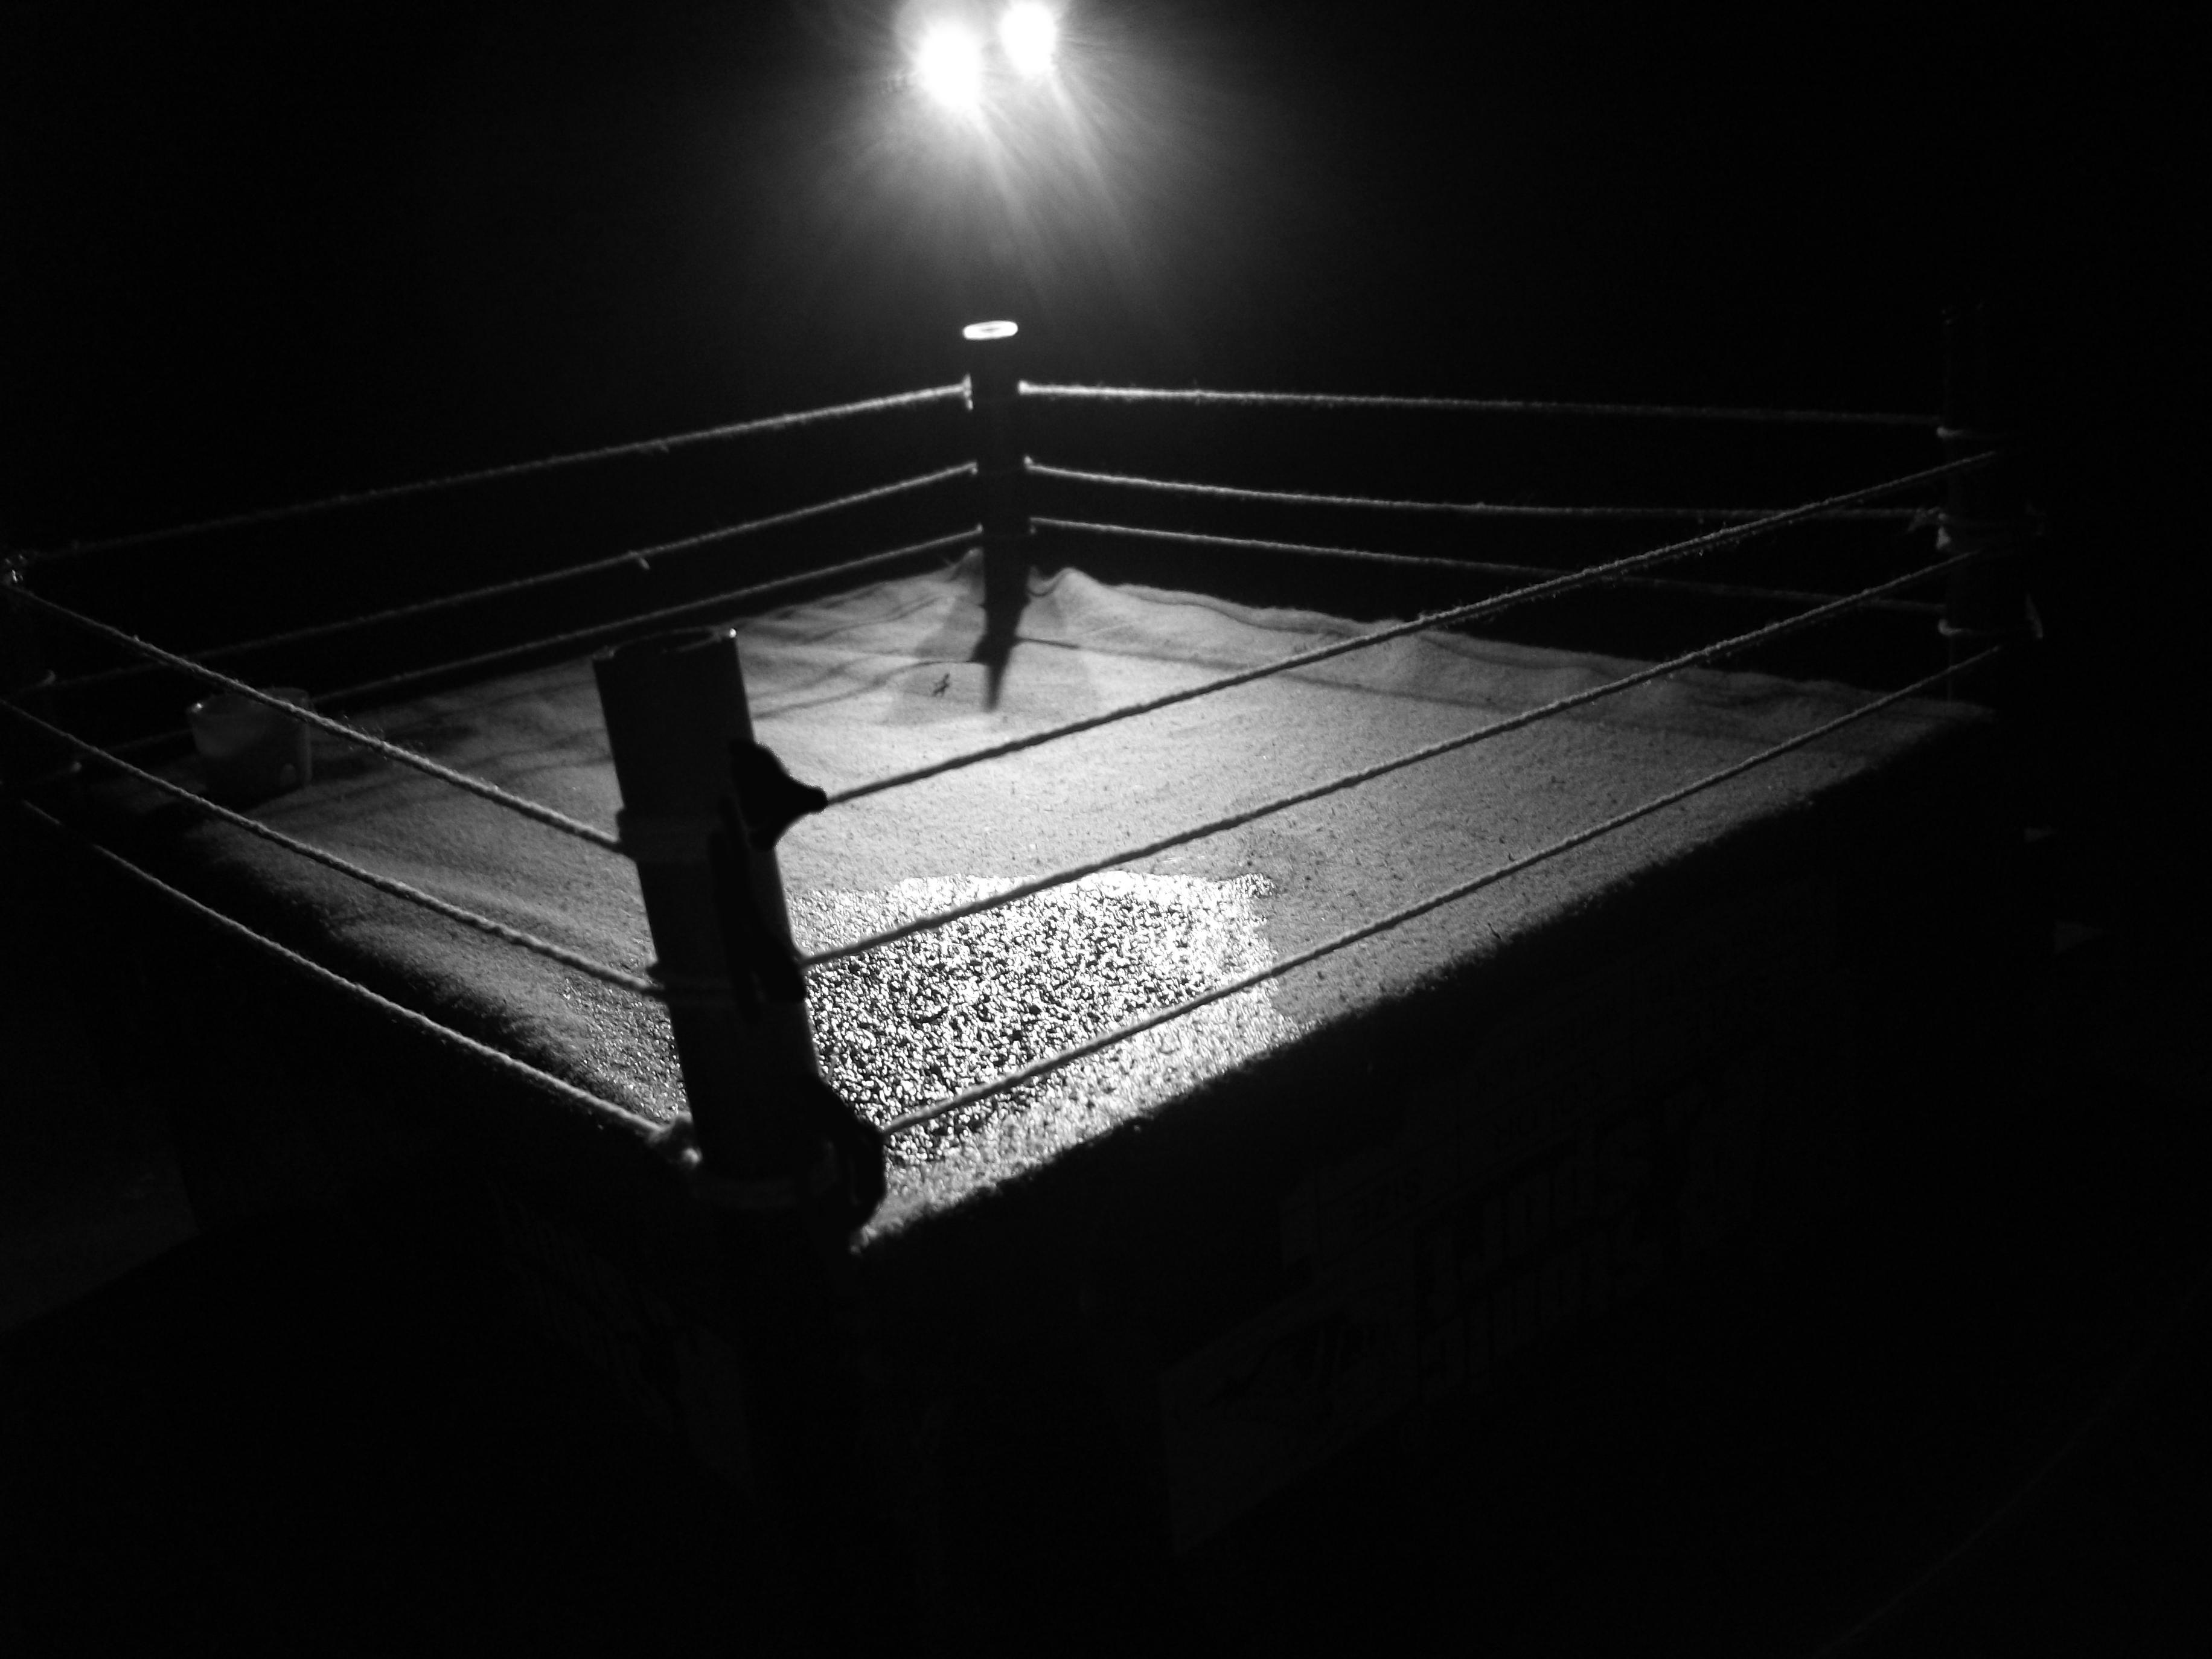 Wrestling ring background